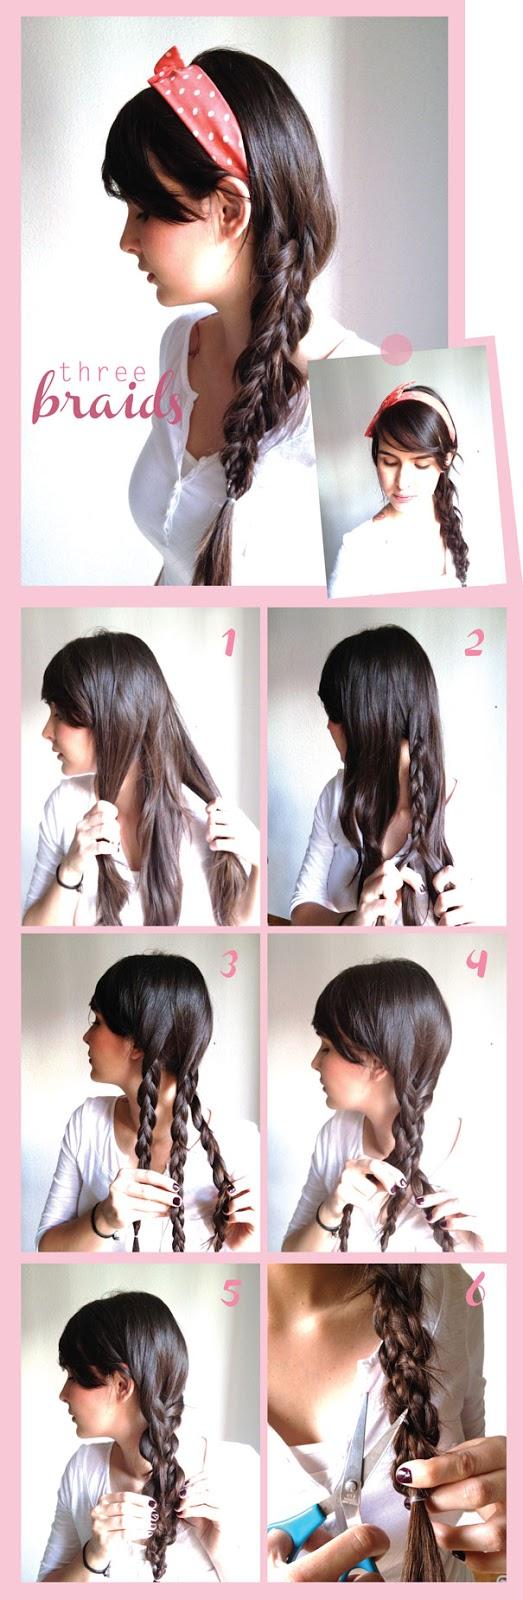 How to make three braids beauty tutorials haj pinterest